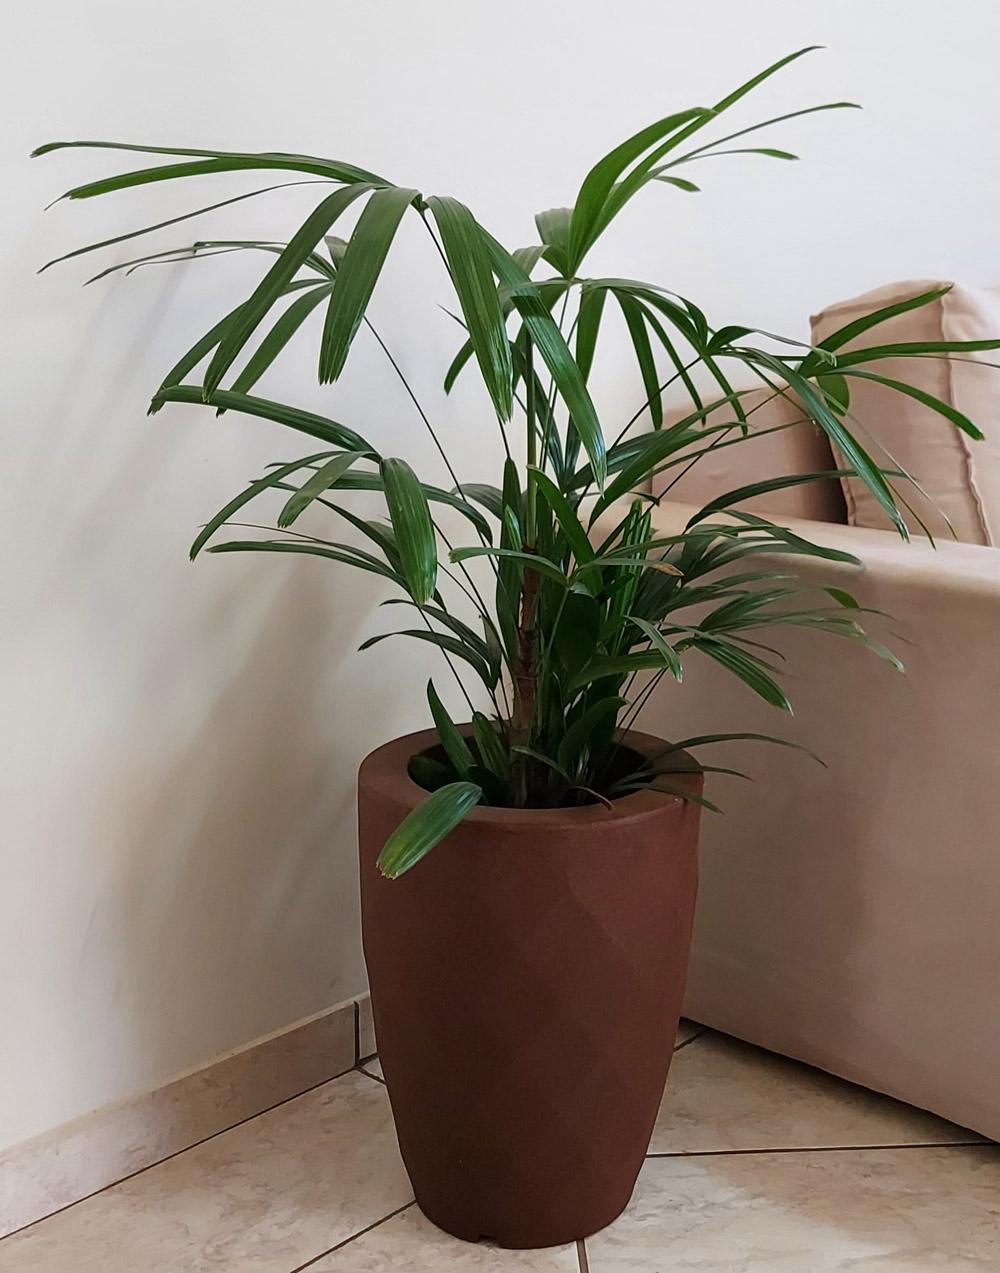 Vaso Safira Cônico Ferrugem 40cm altura x 29,5cm largura